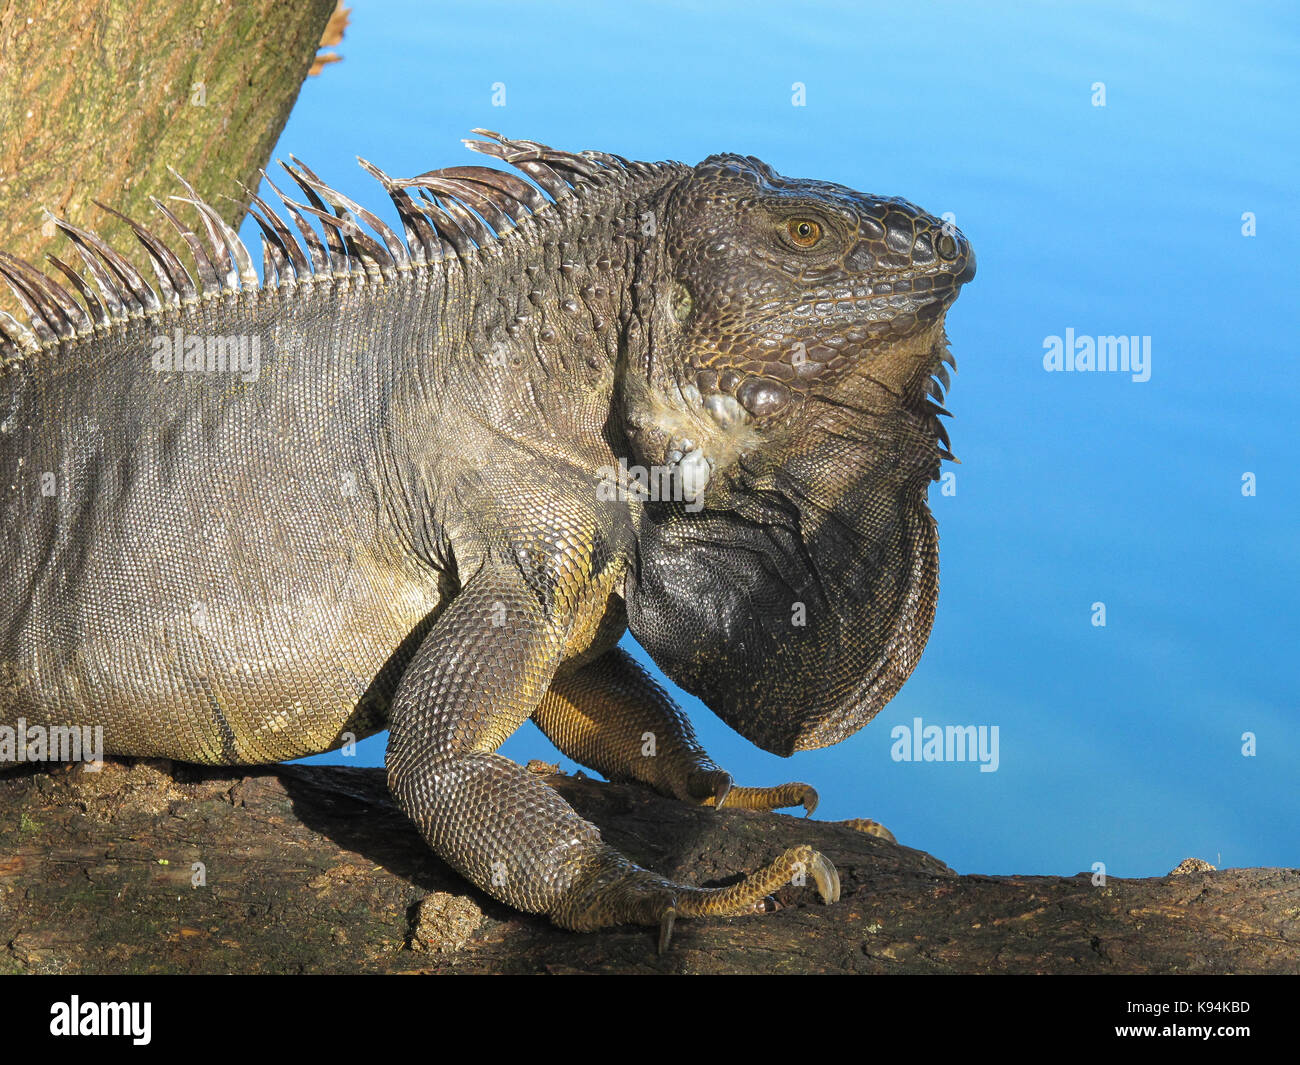 A lizard in Parque northe  of  Medellin colombia Stock Photo